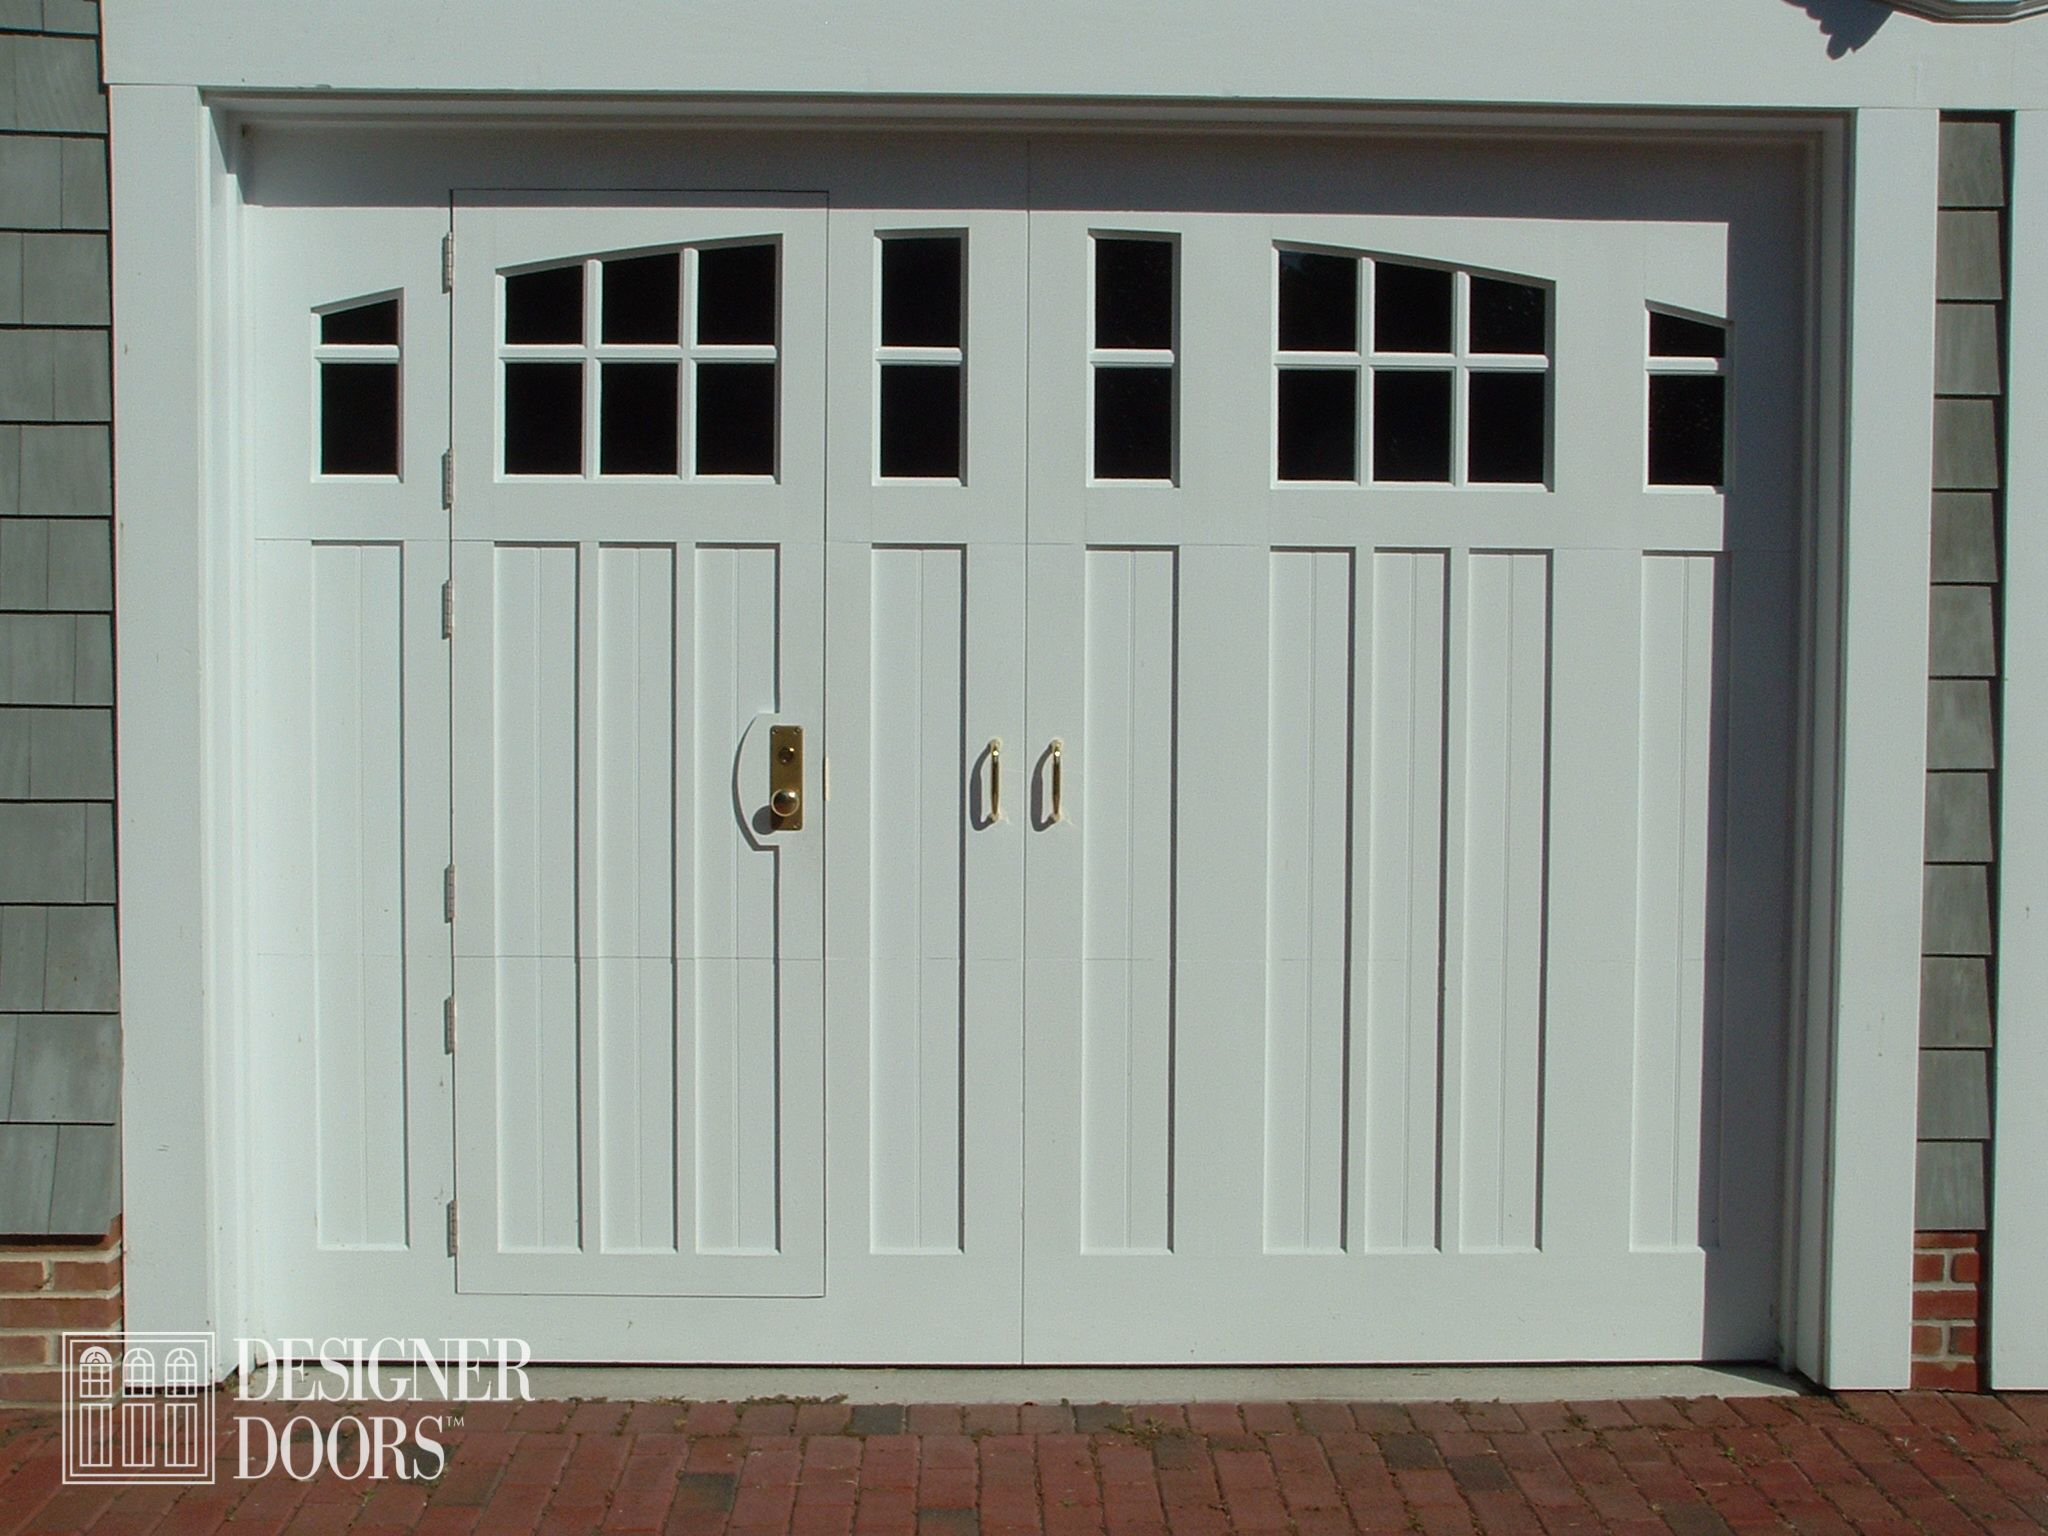 Good Walk Through Or Drive Through. Www.designerdoors.com. Garage DoorsHouse ...